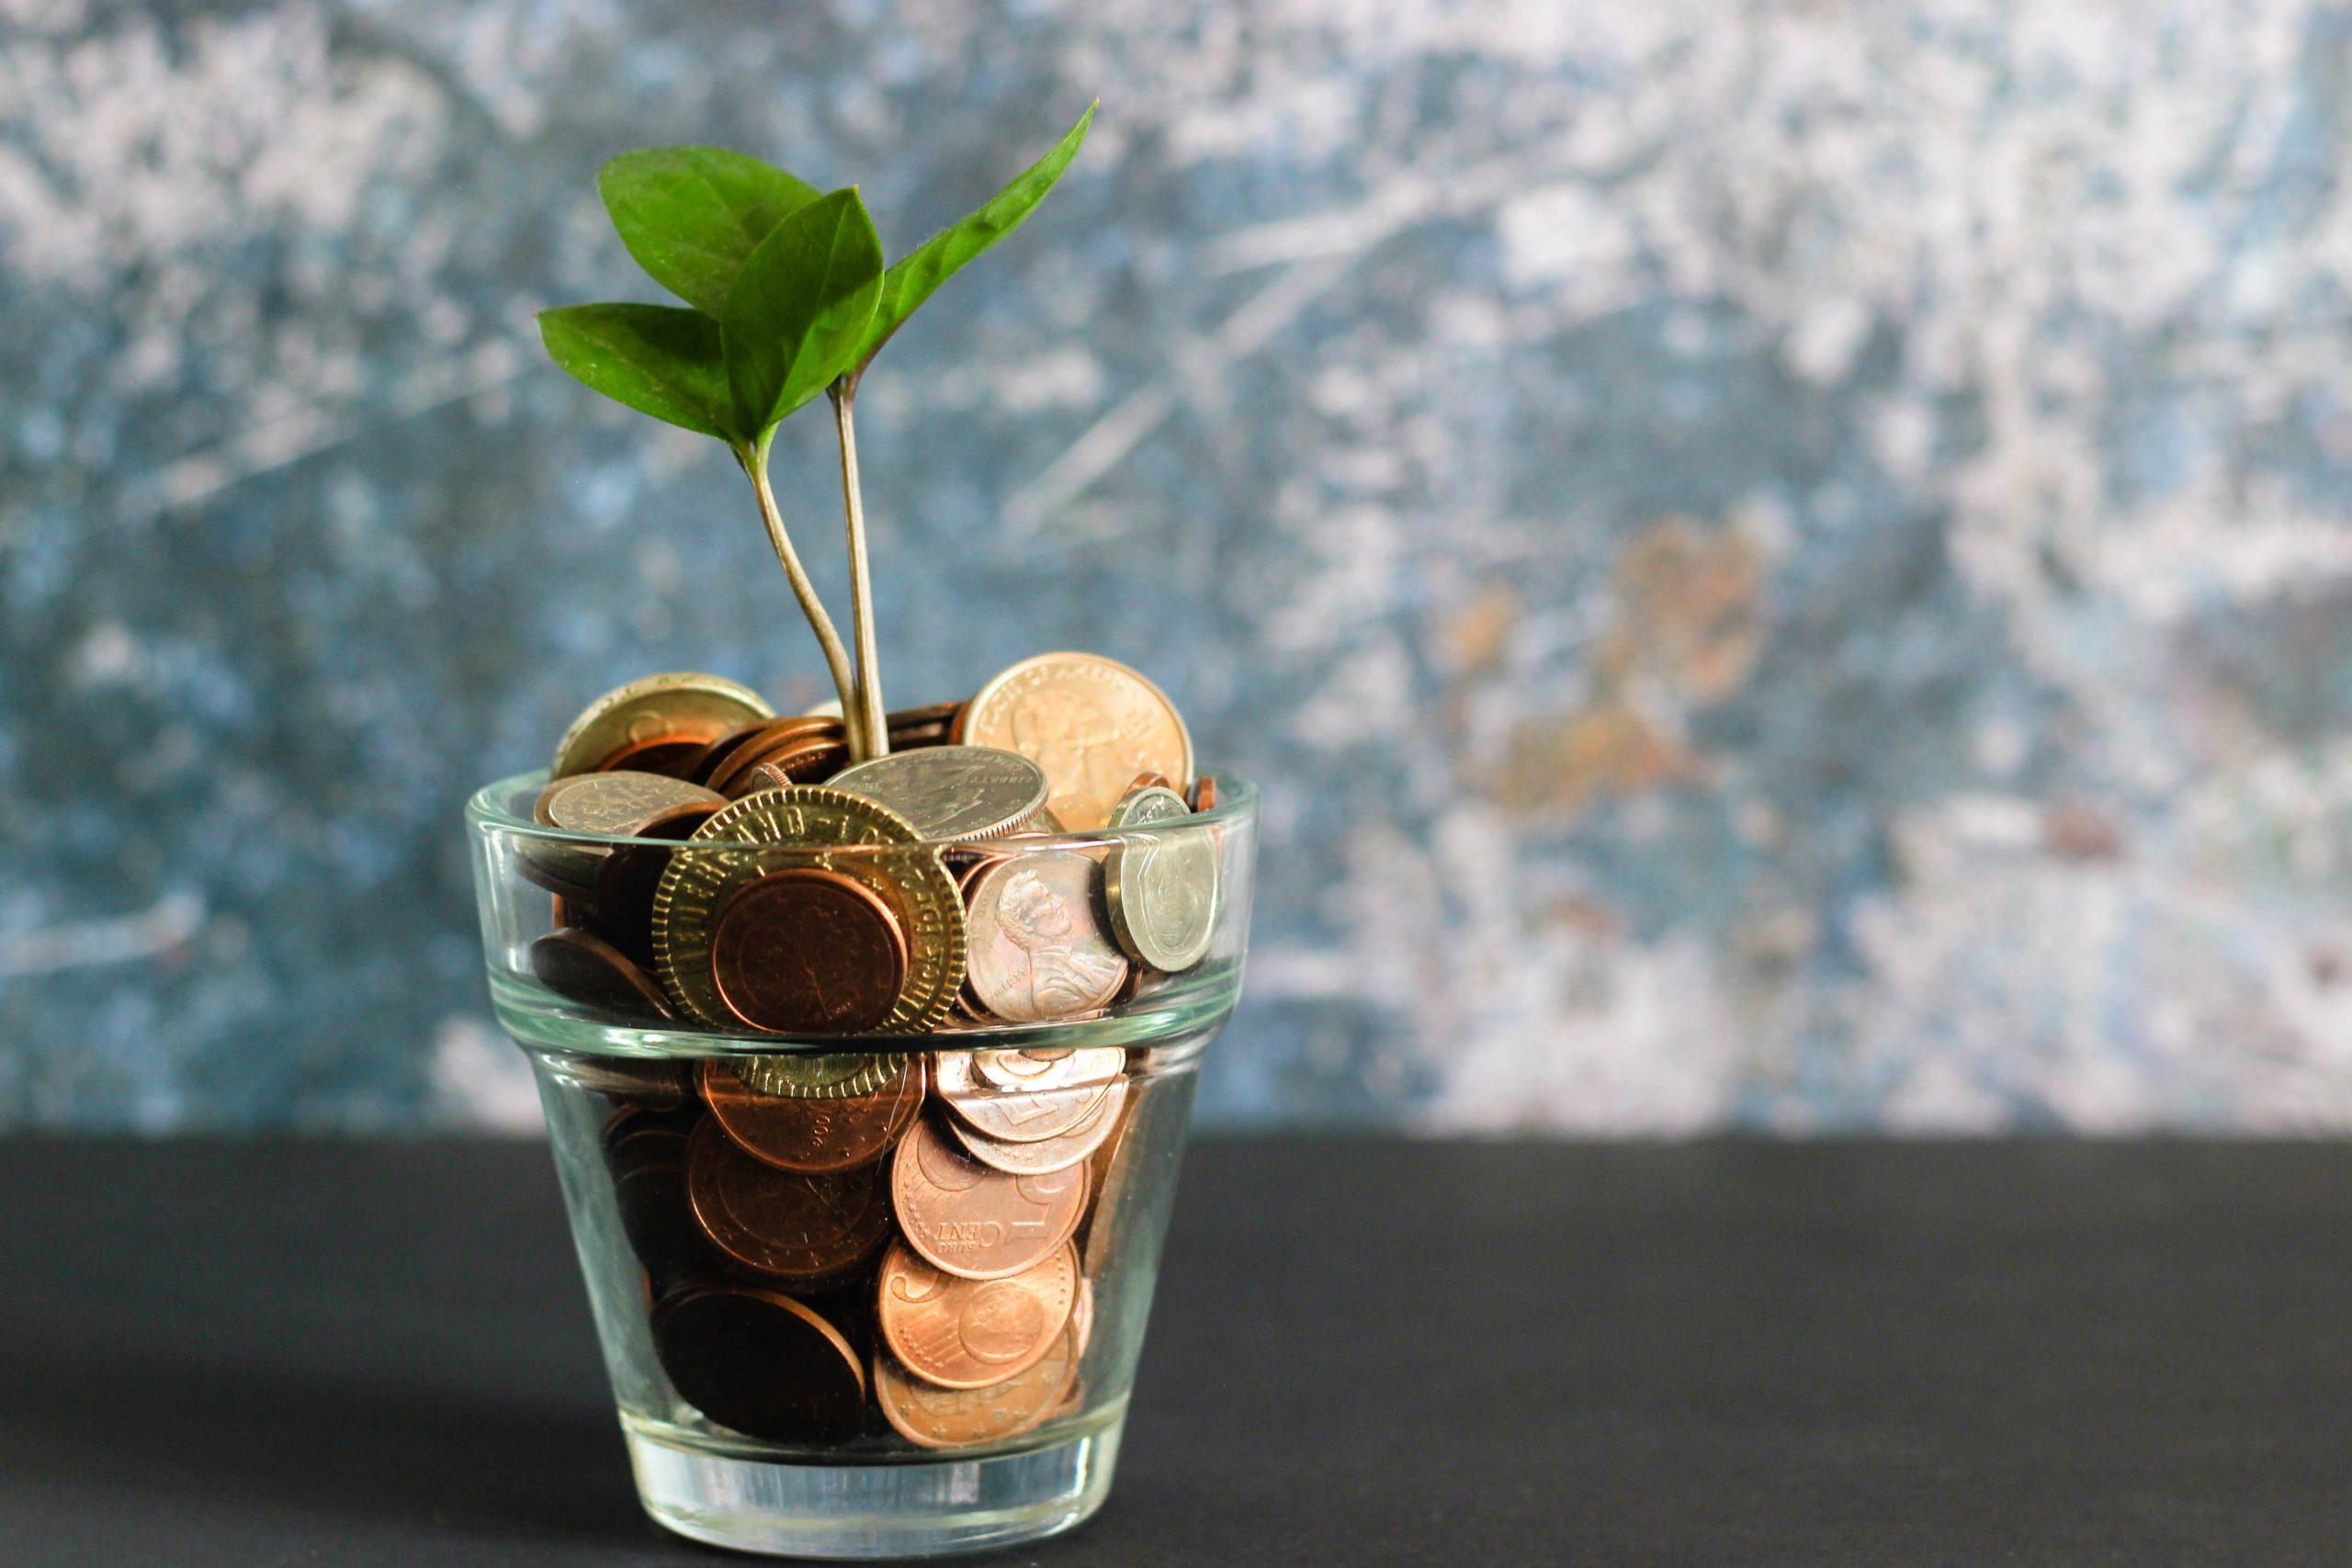 Ondanks coronacrisis stijgende lonen